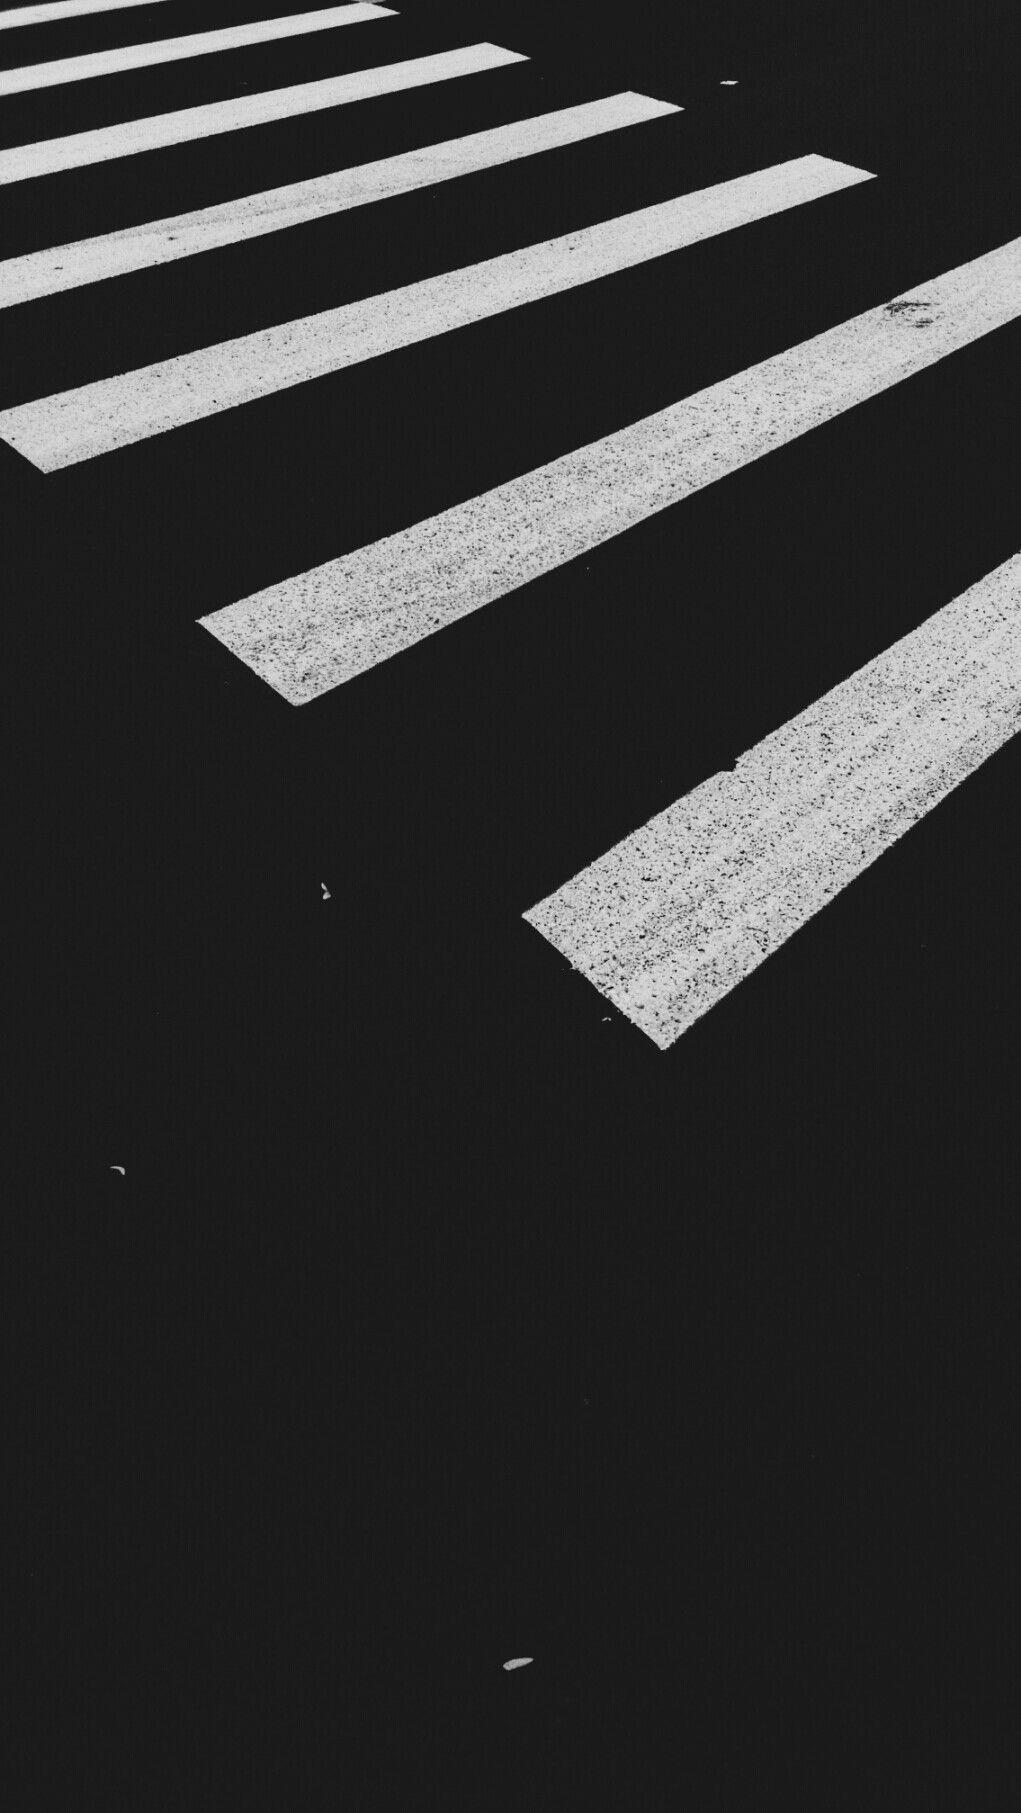 Background Hitam Putih Hd : background, hitam, putih, Wallpaper, Abstrak, Hitam, Putih, 1021x1813, Download, WallpaperTip